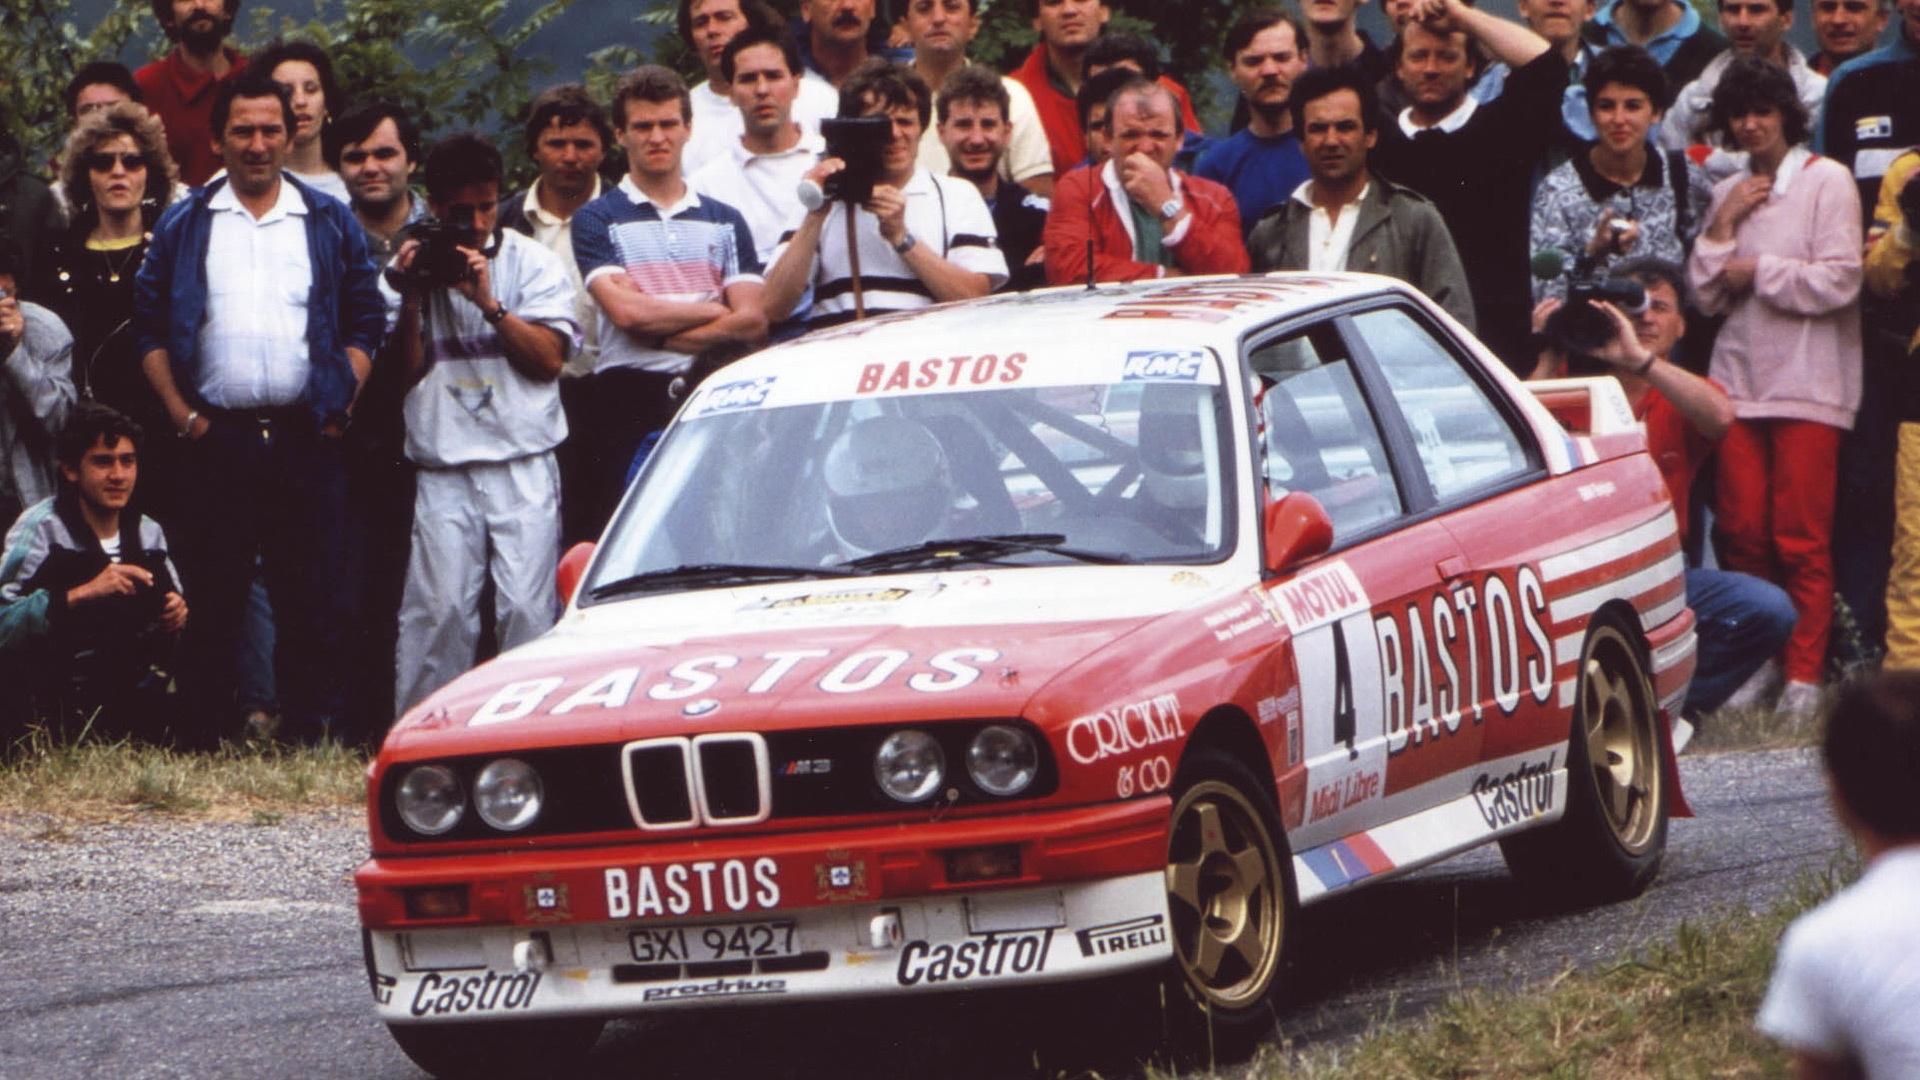 E30 BMW M3 rally car built by Prodrive